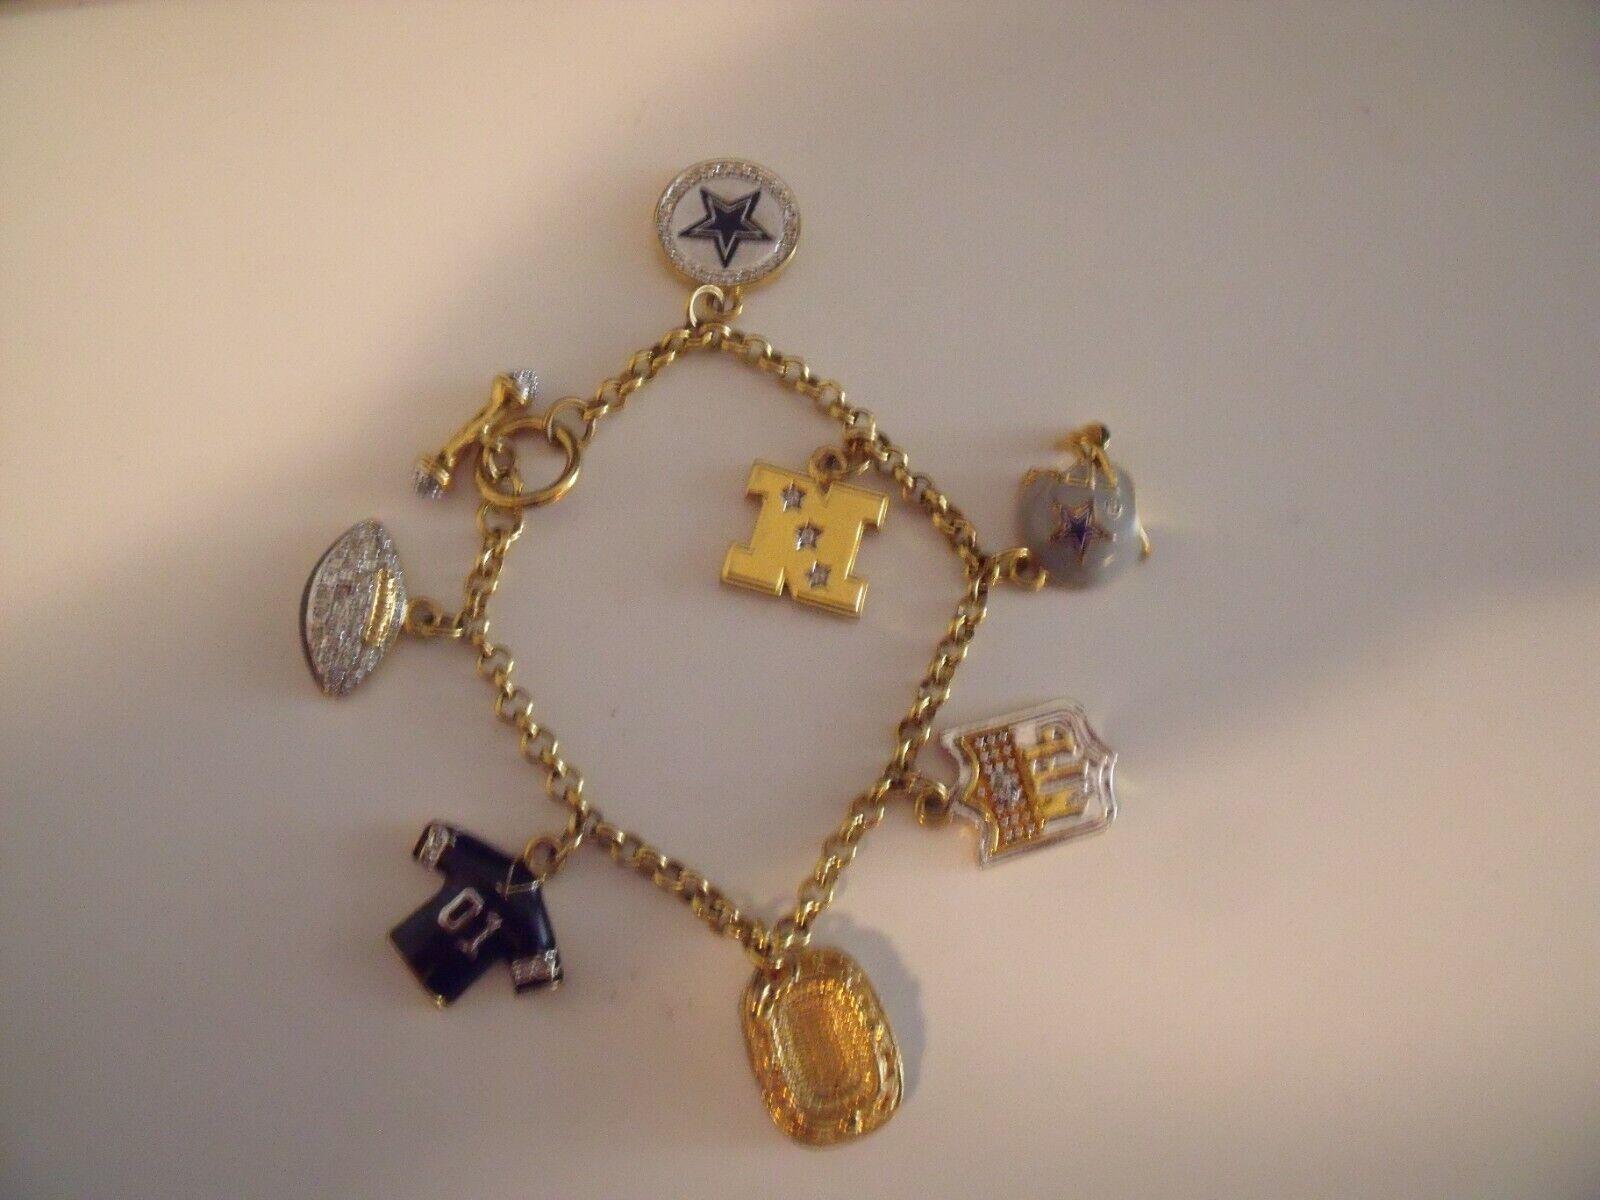 Photo Danbury Mint Dallas Cowboys NFL Football Charm Bracelet Pre Owned